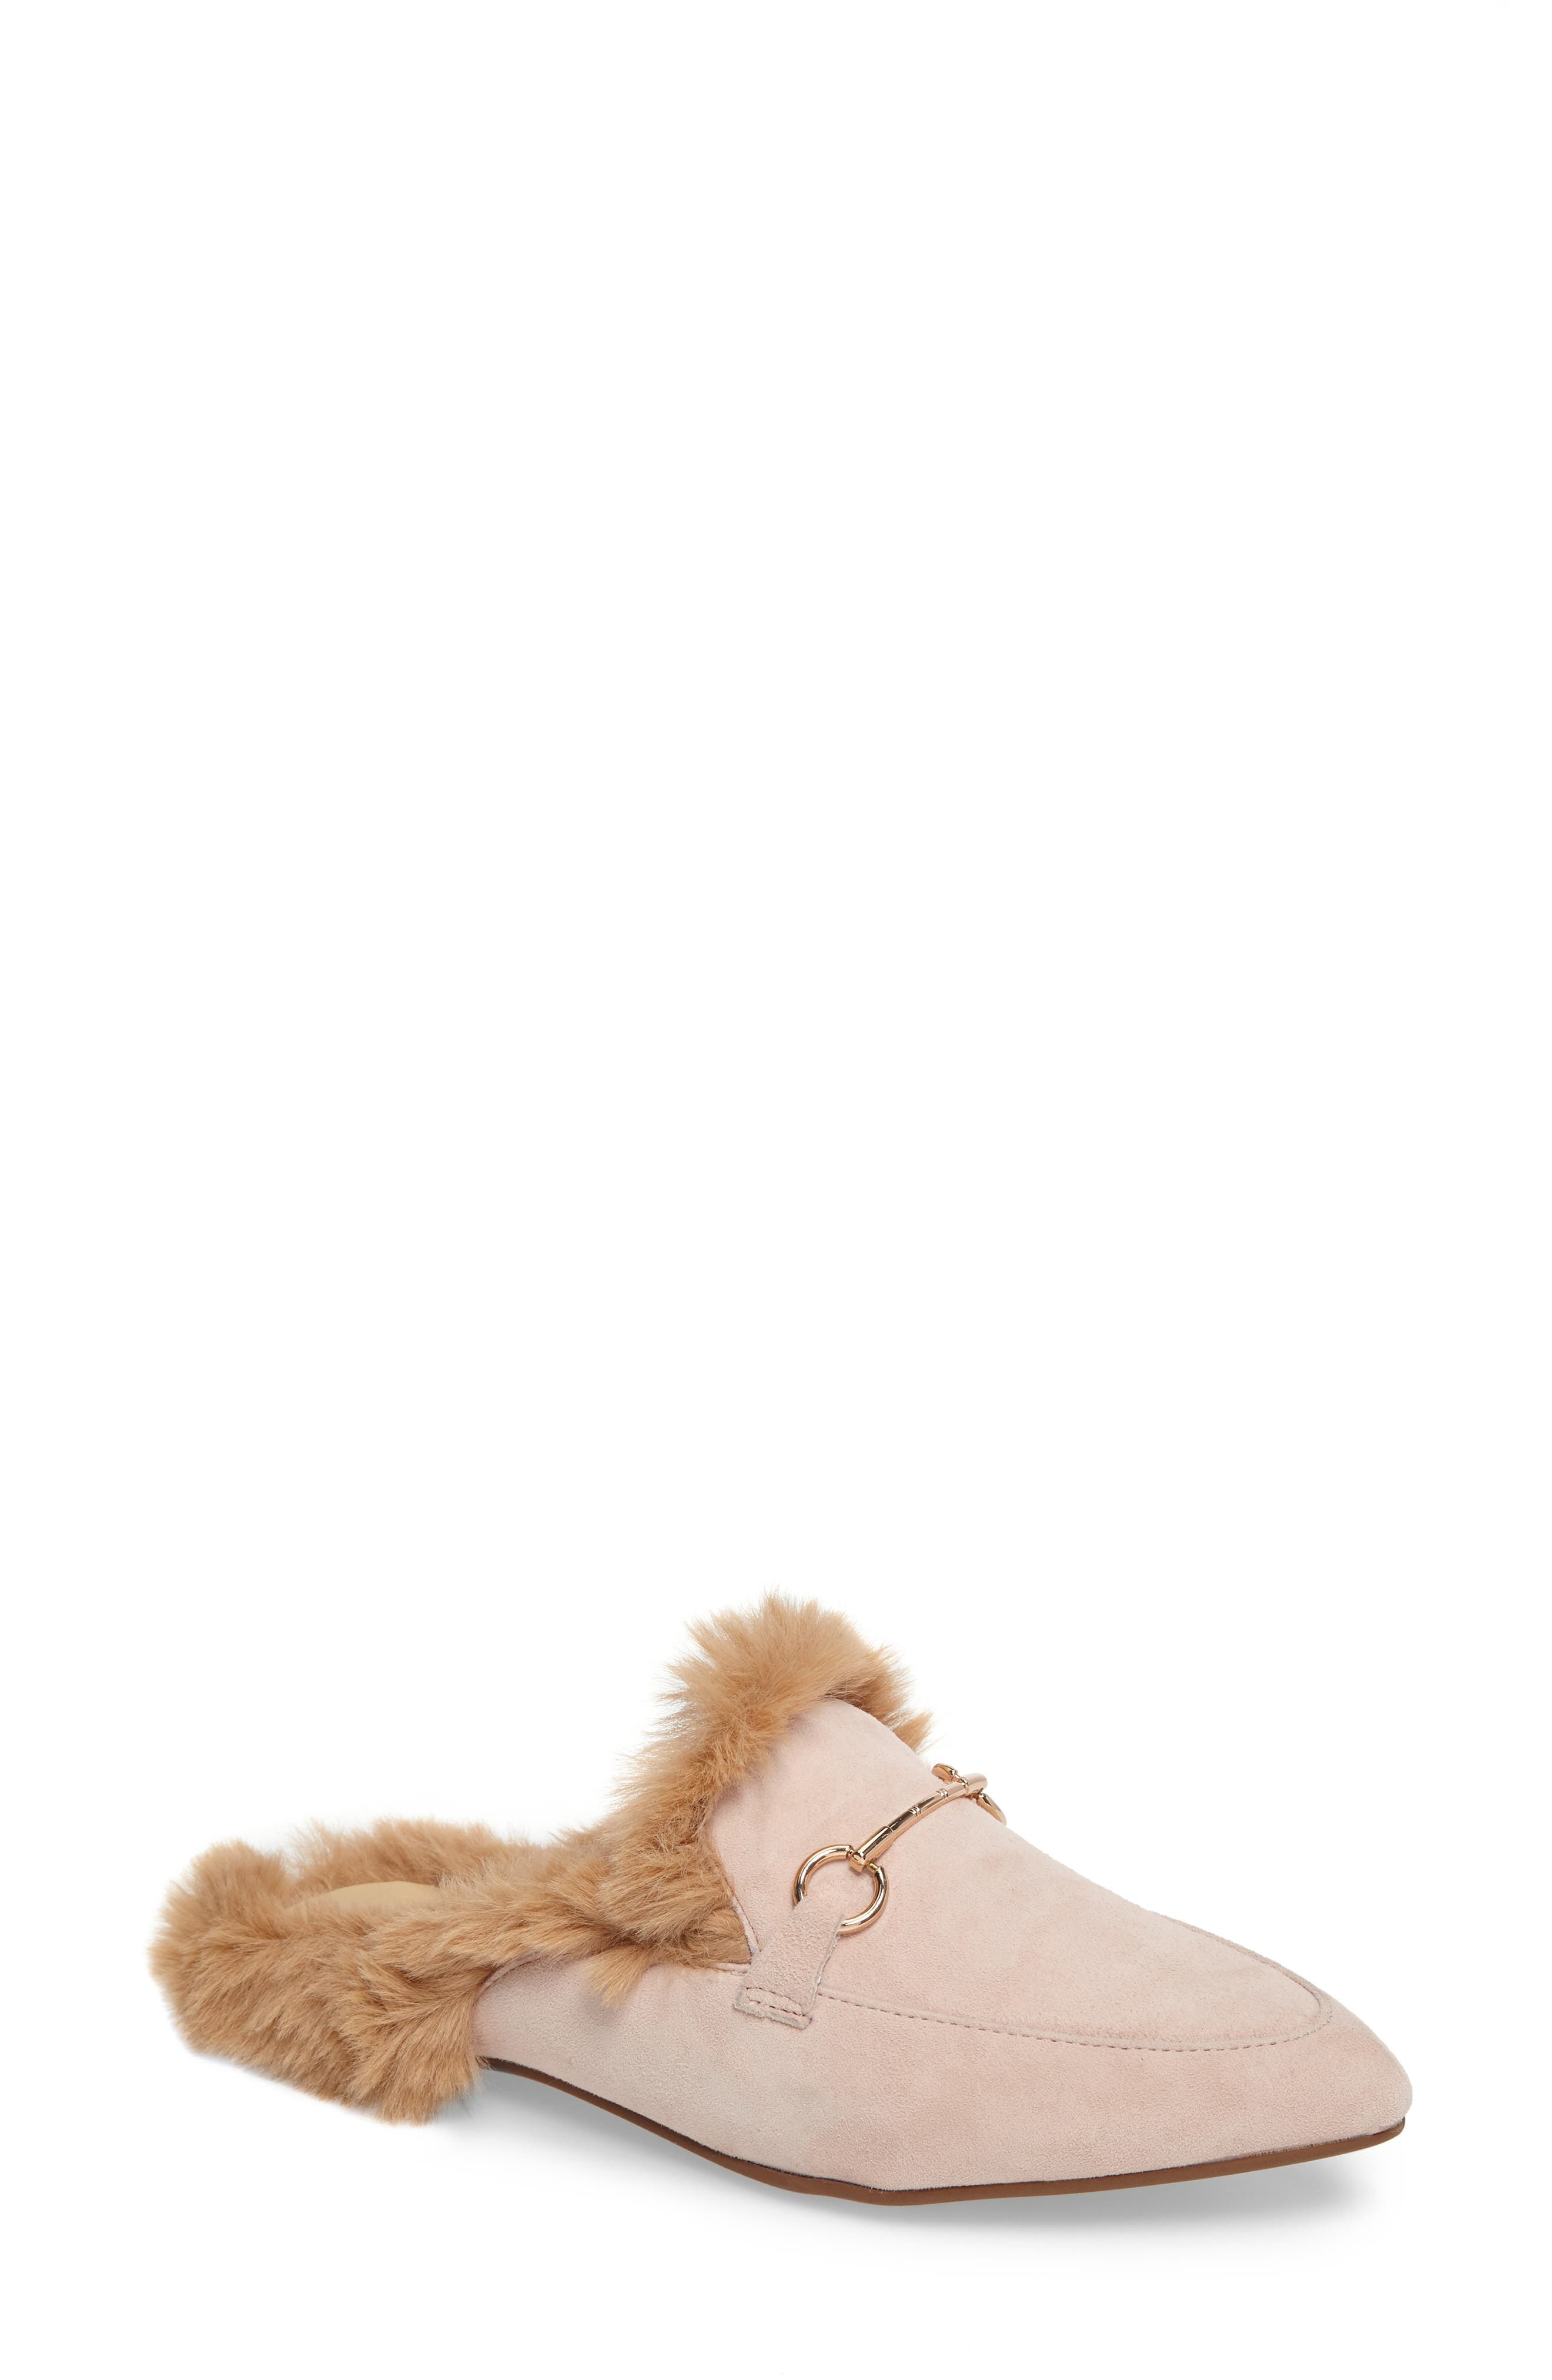 Kristin Cavallari Carter Faux Fur Loafer Mule (Women)